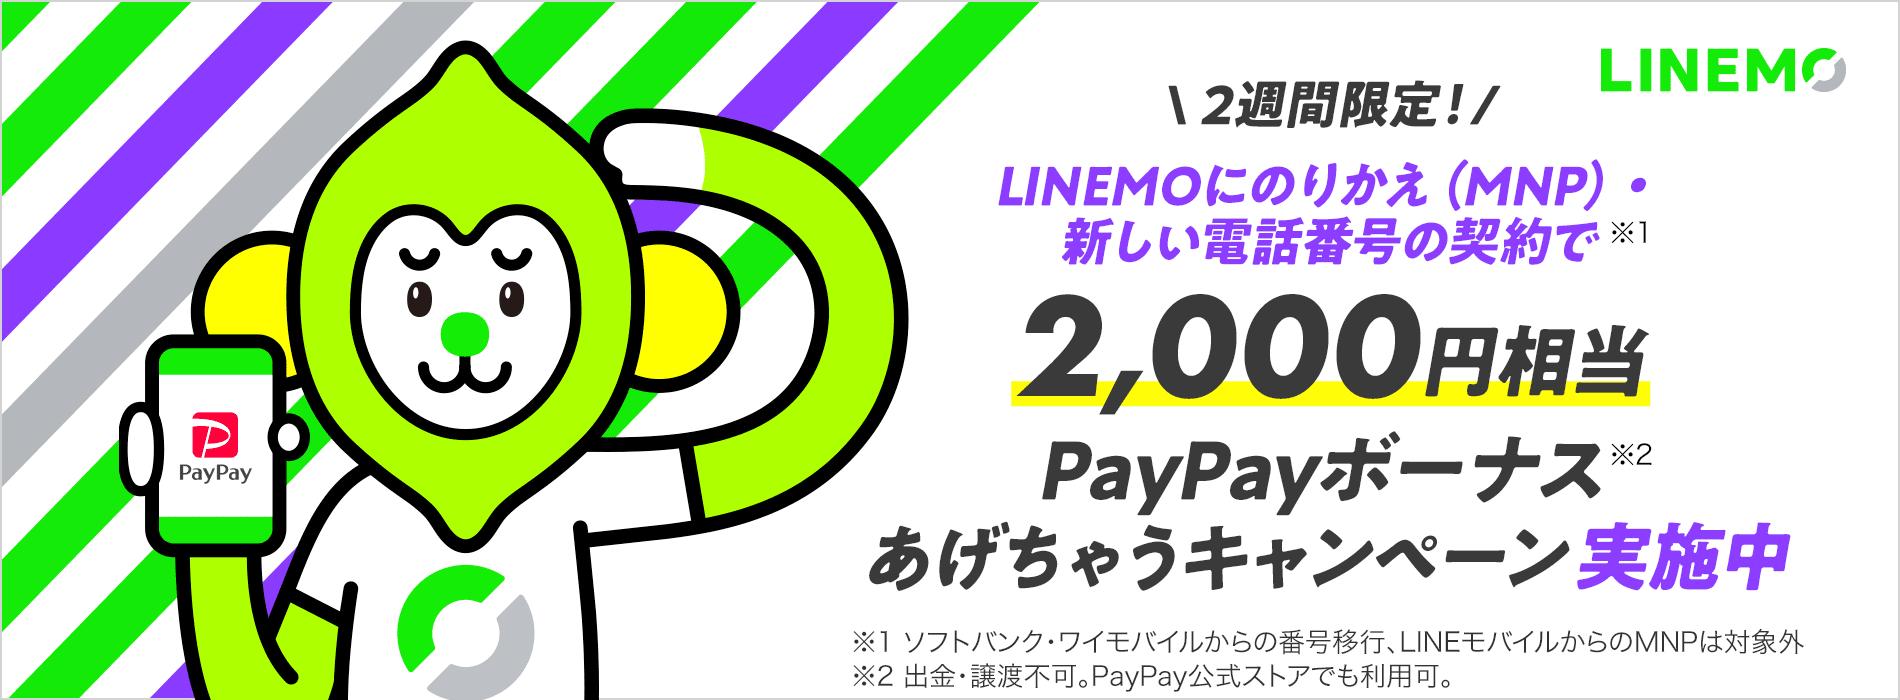 LINEMO 2週間限定 LINEMOにのりかえ(MNP)・新しい電話番号の契約で※1 2,000円相当PayPayボーナス※2 あげちゃうキャンペーン実施中 ※1 ソフトバンク・ワイモバイルからの番号移行、LINEモバイルからのMNPは対象外 ※2 出金・譲渡不可。PayPay公式ストアでも利用可。